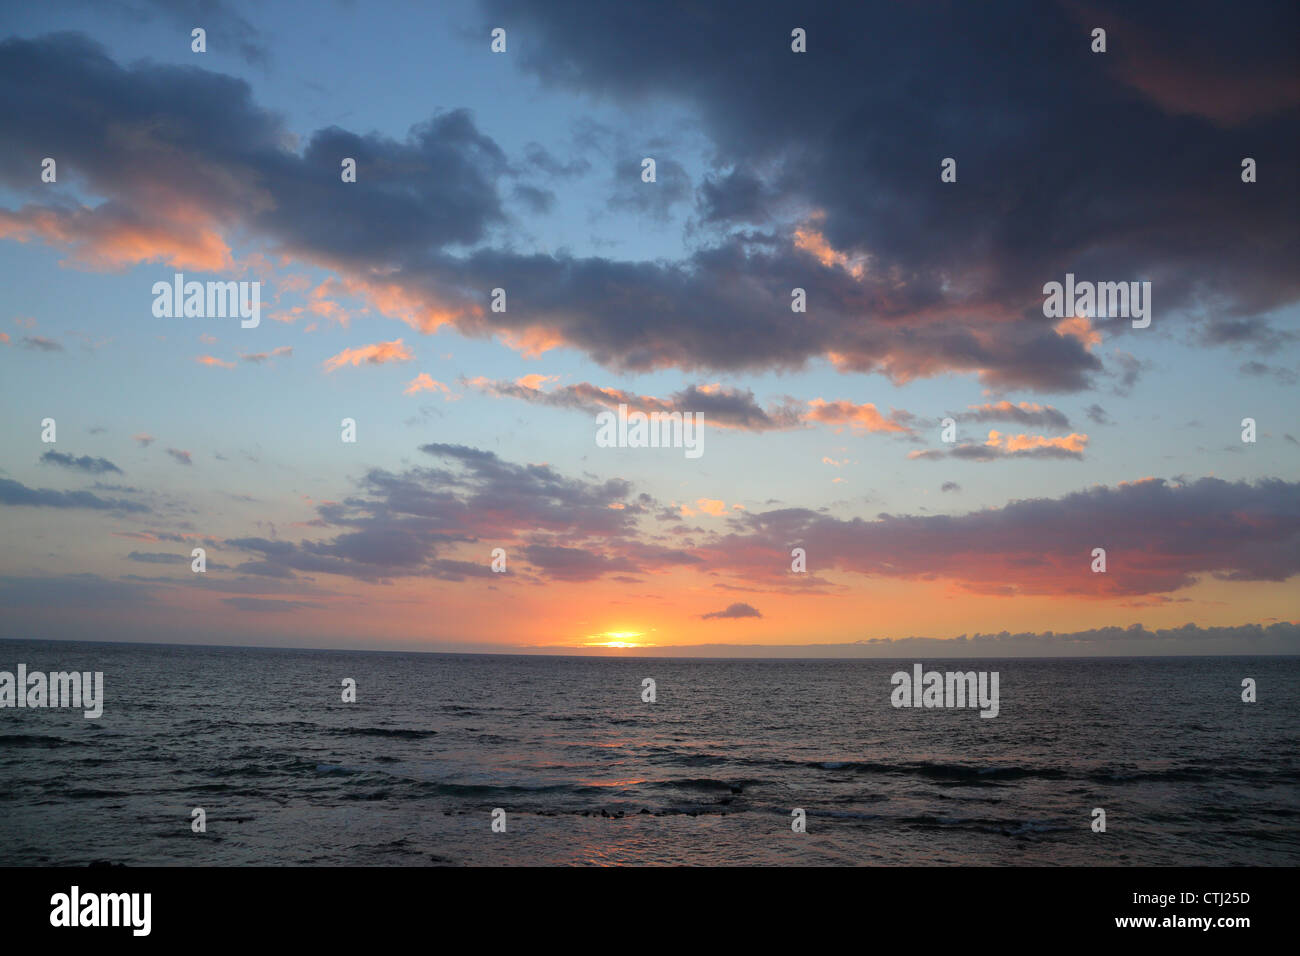 Sonnenuntergang über dem Pazifik, Big Island, Hawaii Stockbild